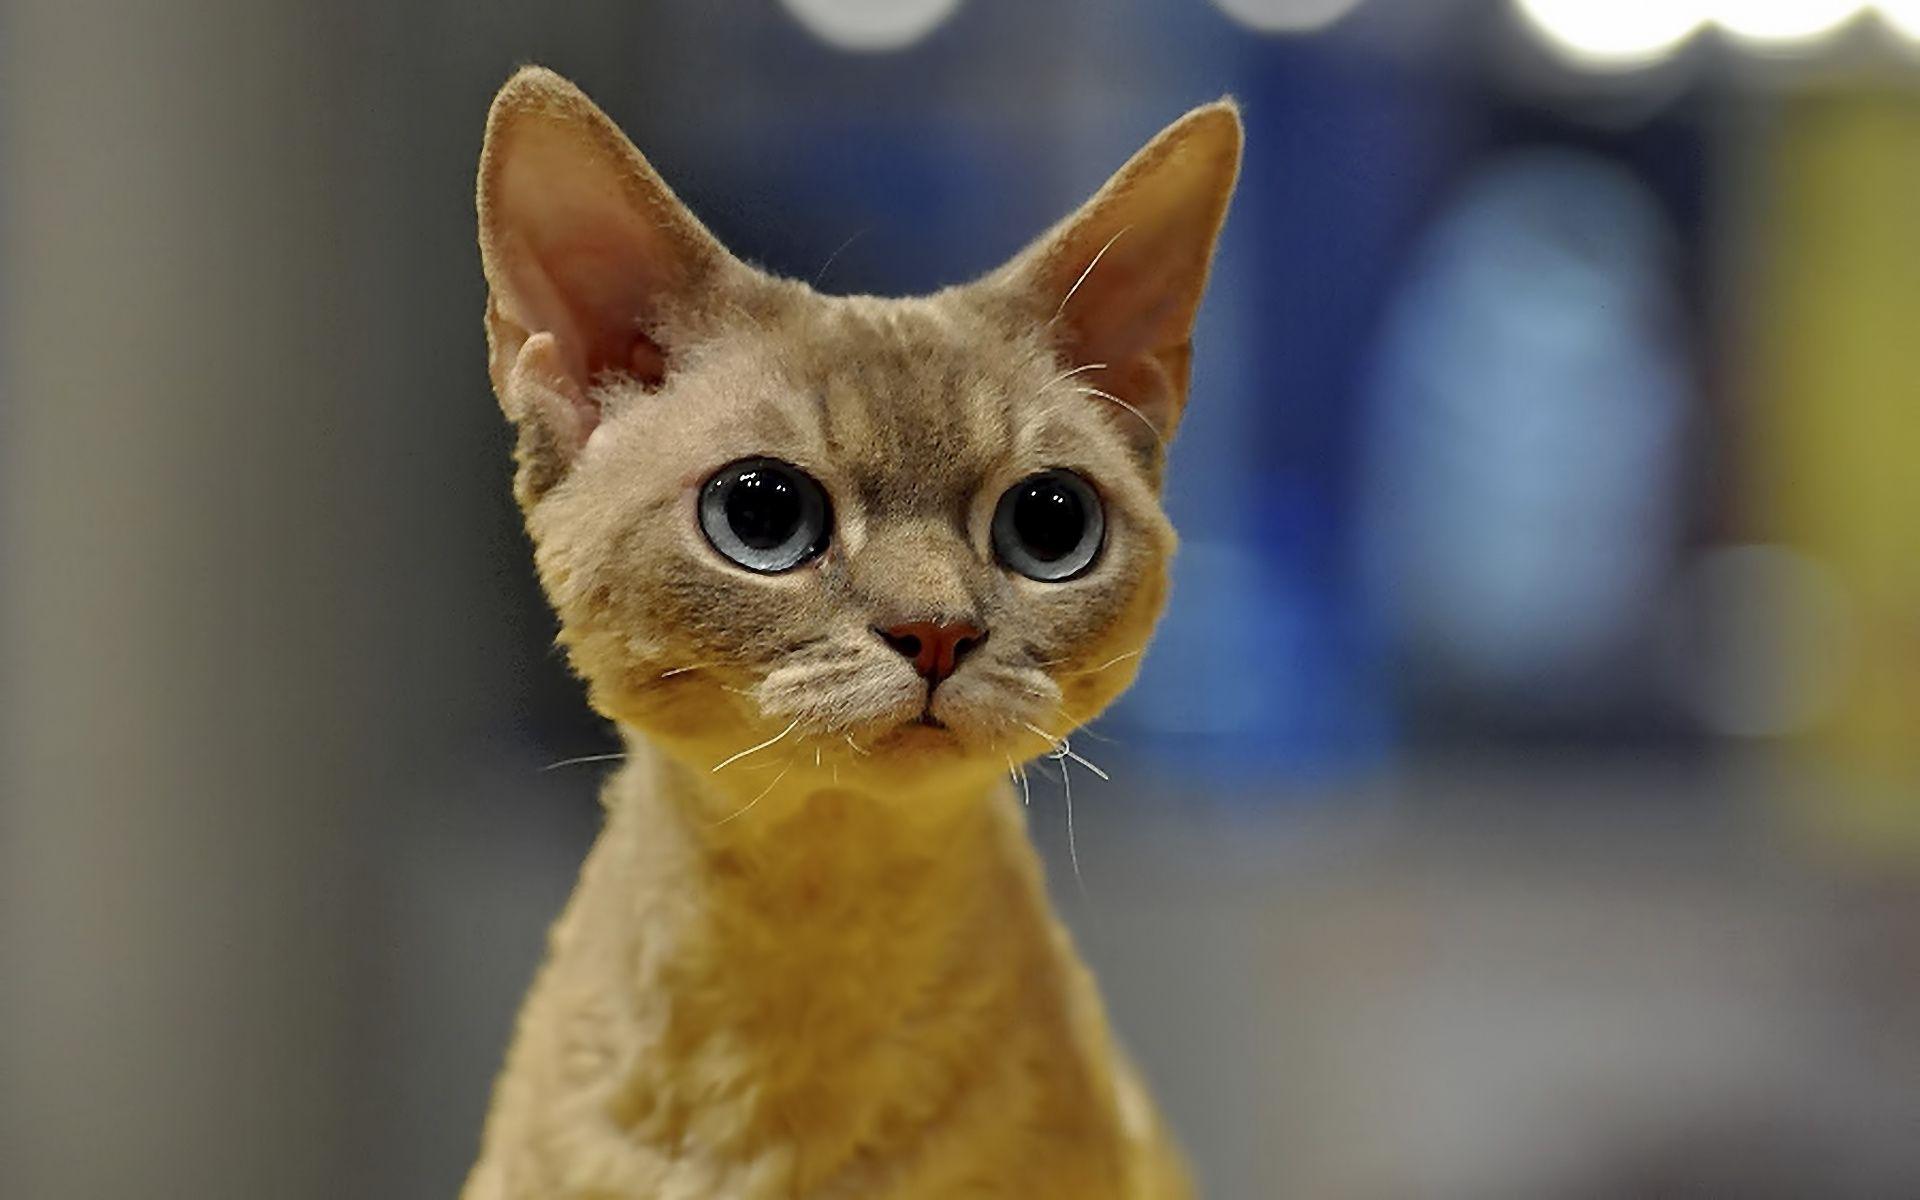 Cute big cat eyes | Anatomy Reference - Animal | Pinterest | Cat ...